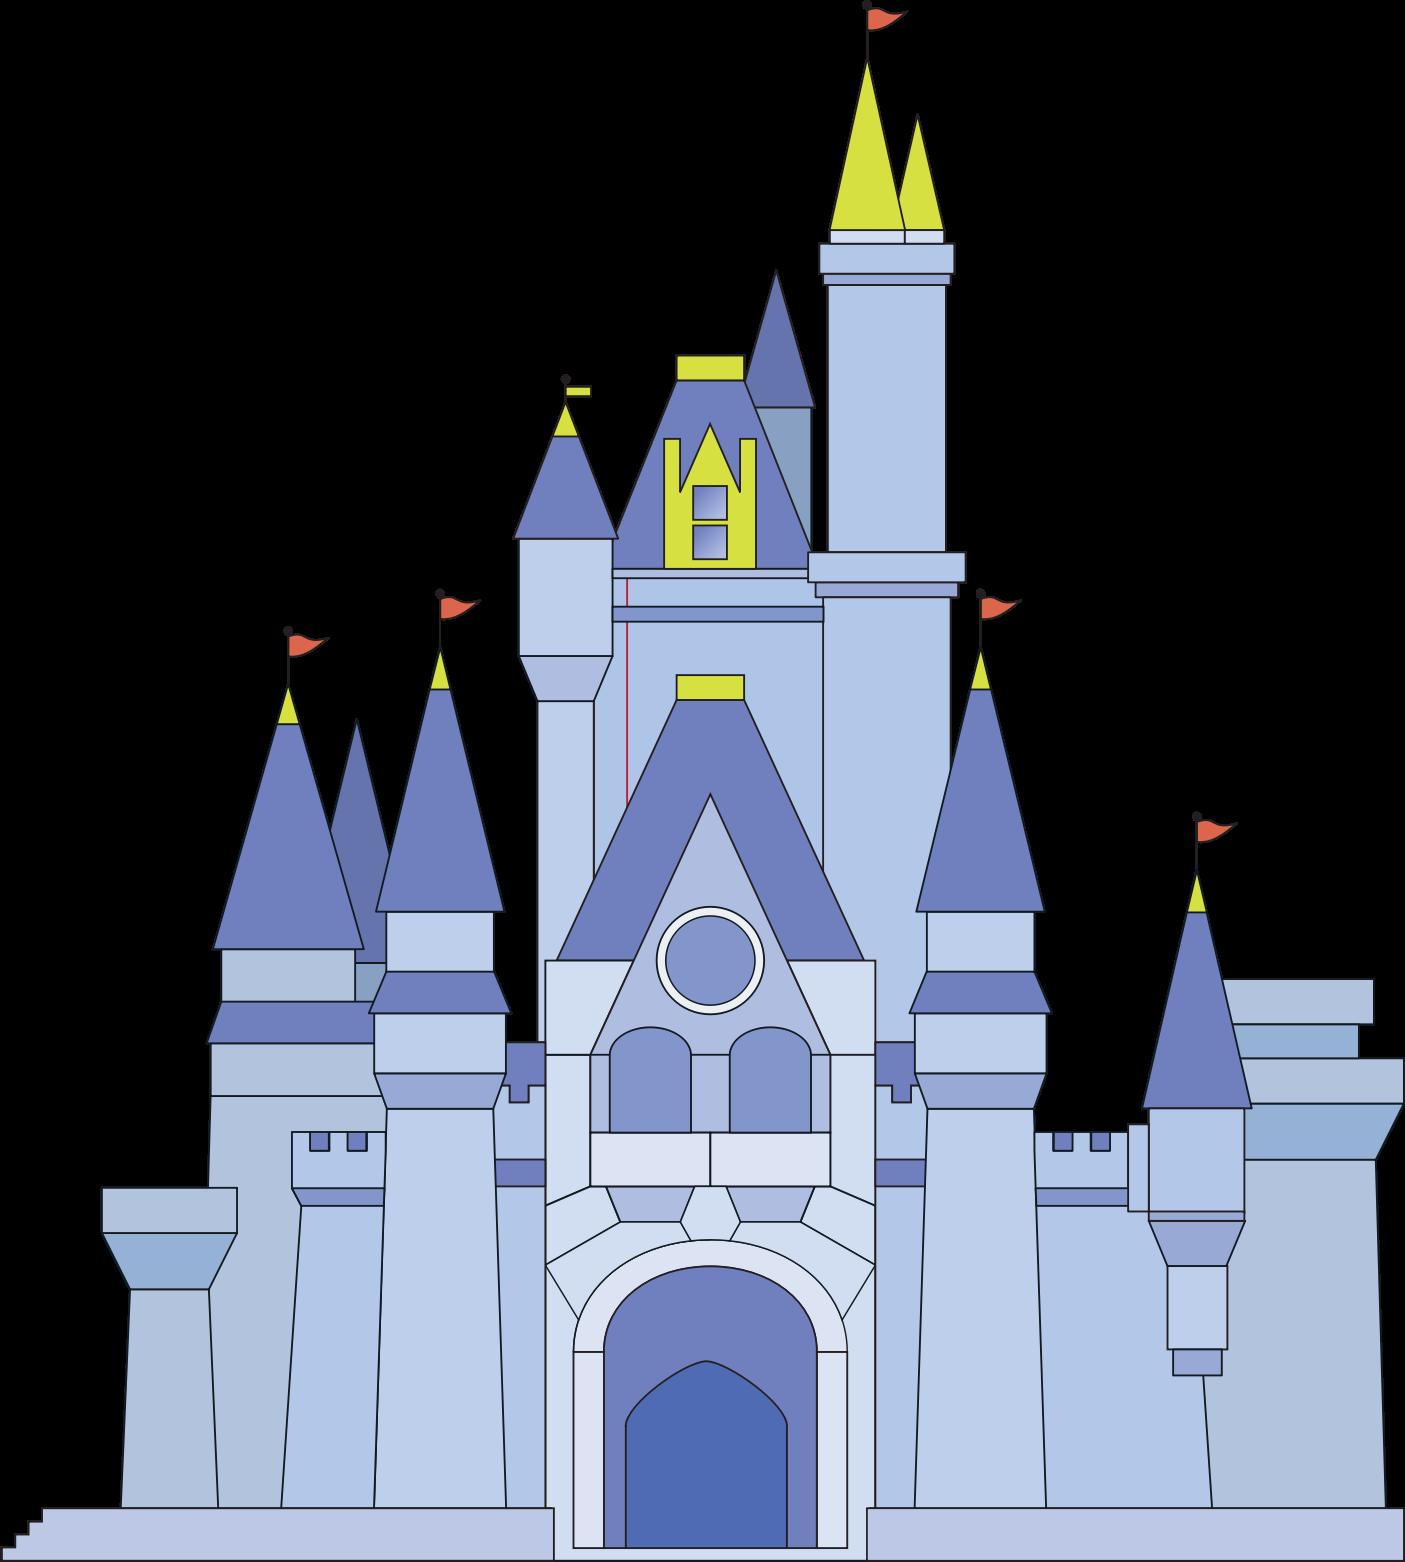 jpg royalty free stock Castle clipart mickey mouse. Magic kingdom sleeping beauty.